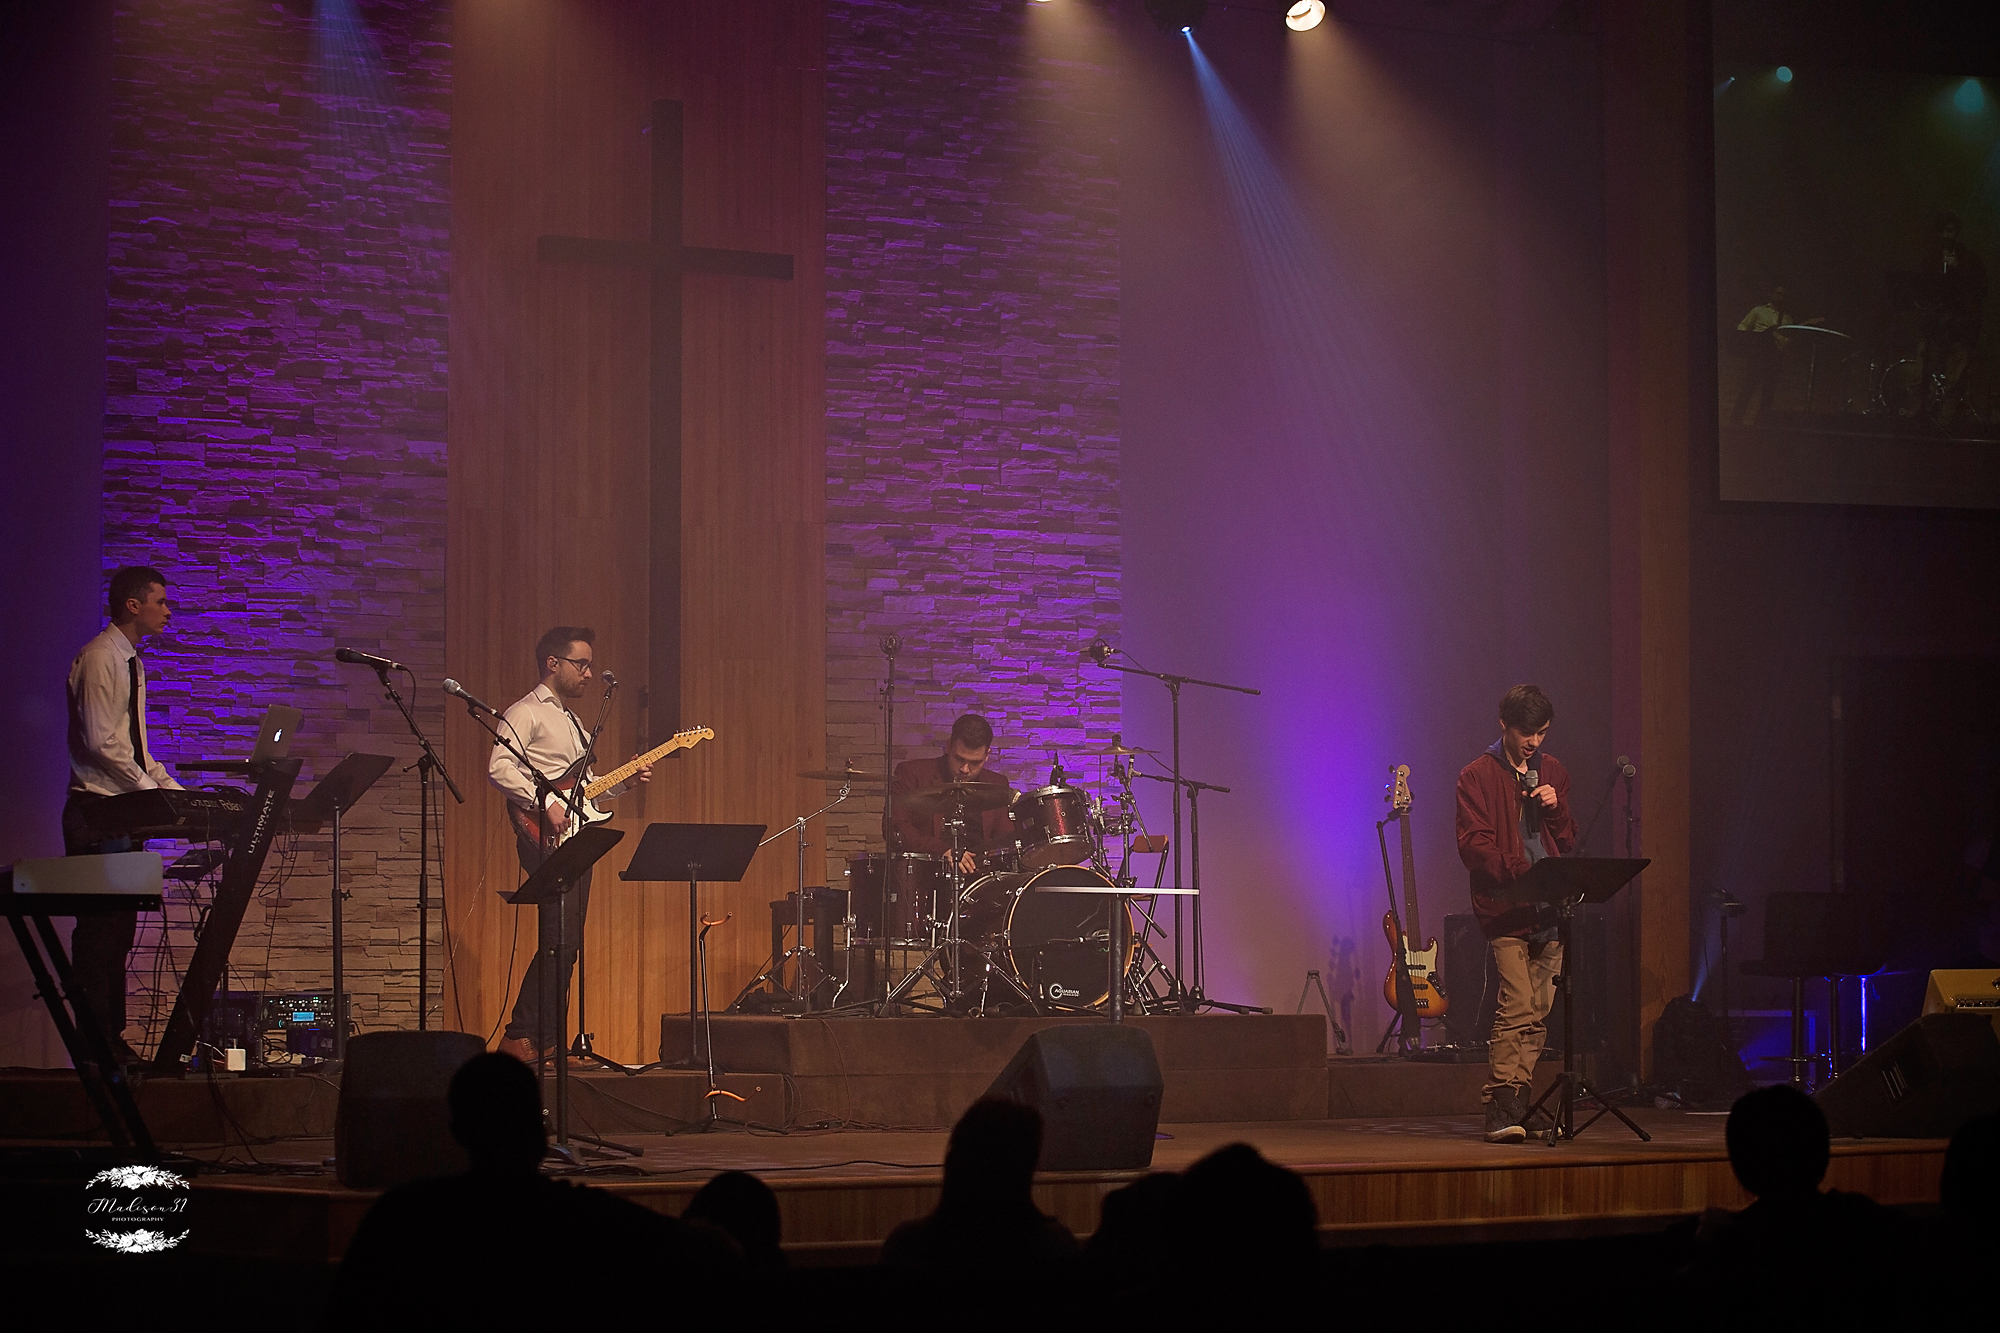 A night of Love&Worship_0394 copy.jpg